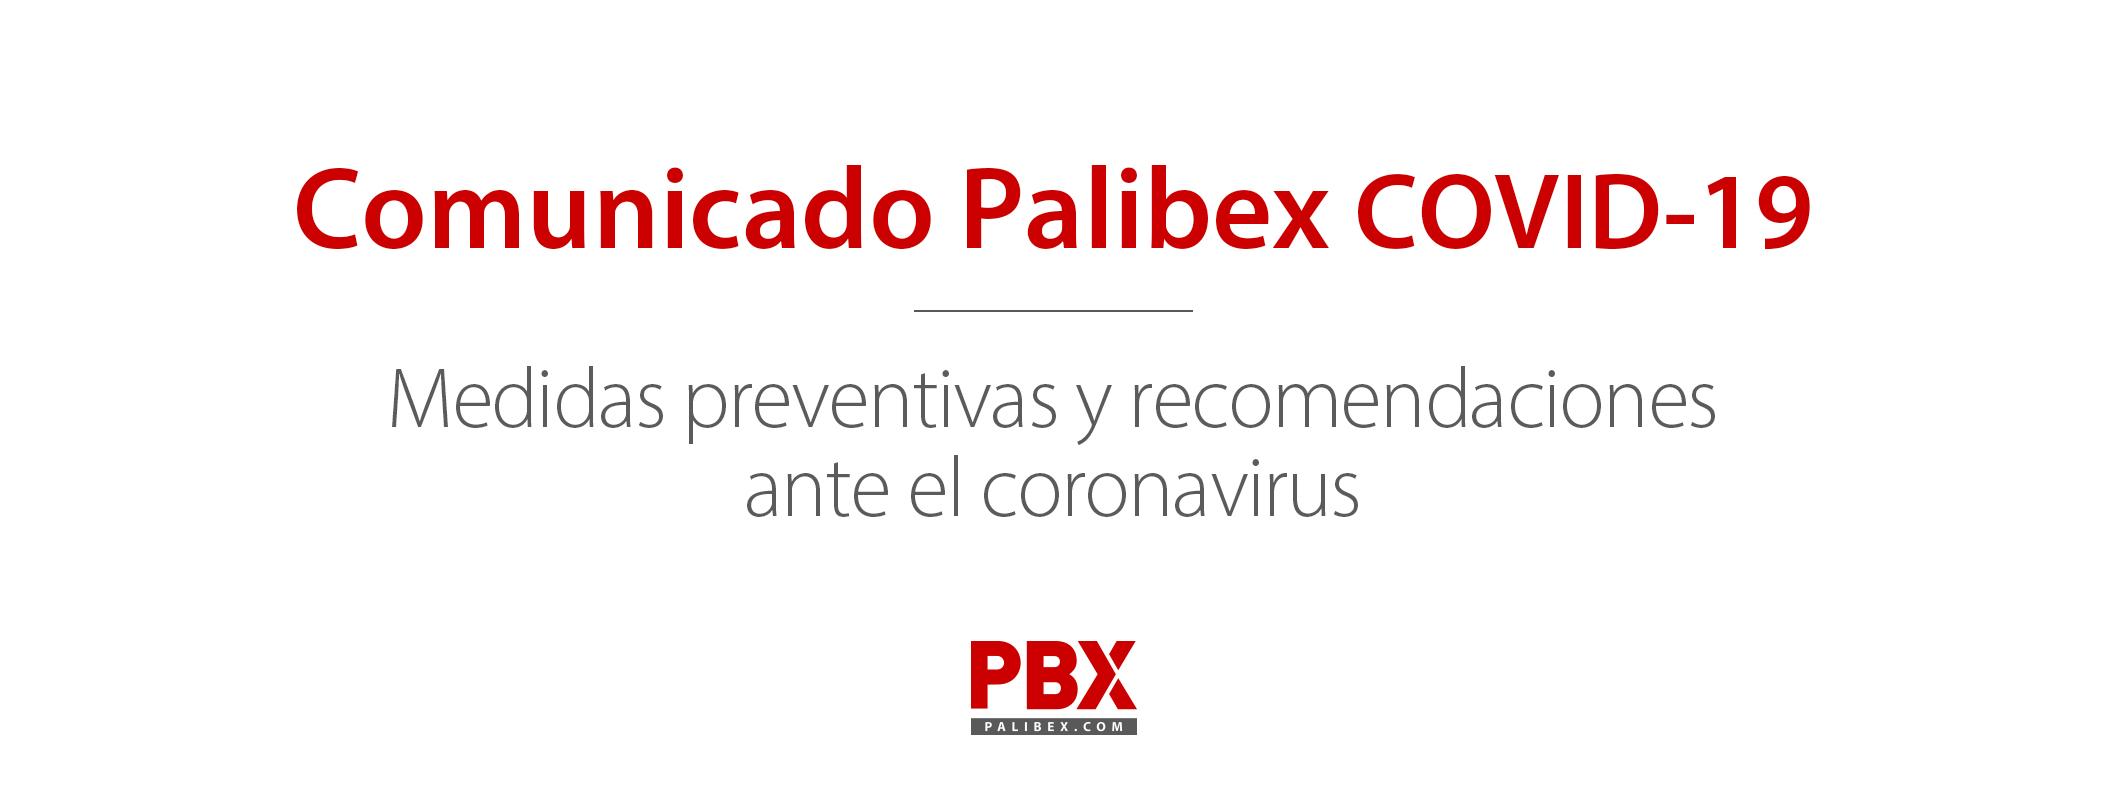 Comunicado Corona virus Palibex